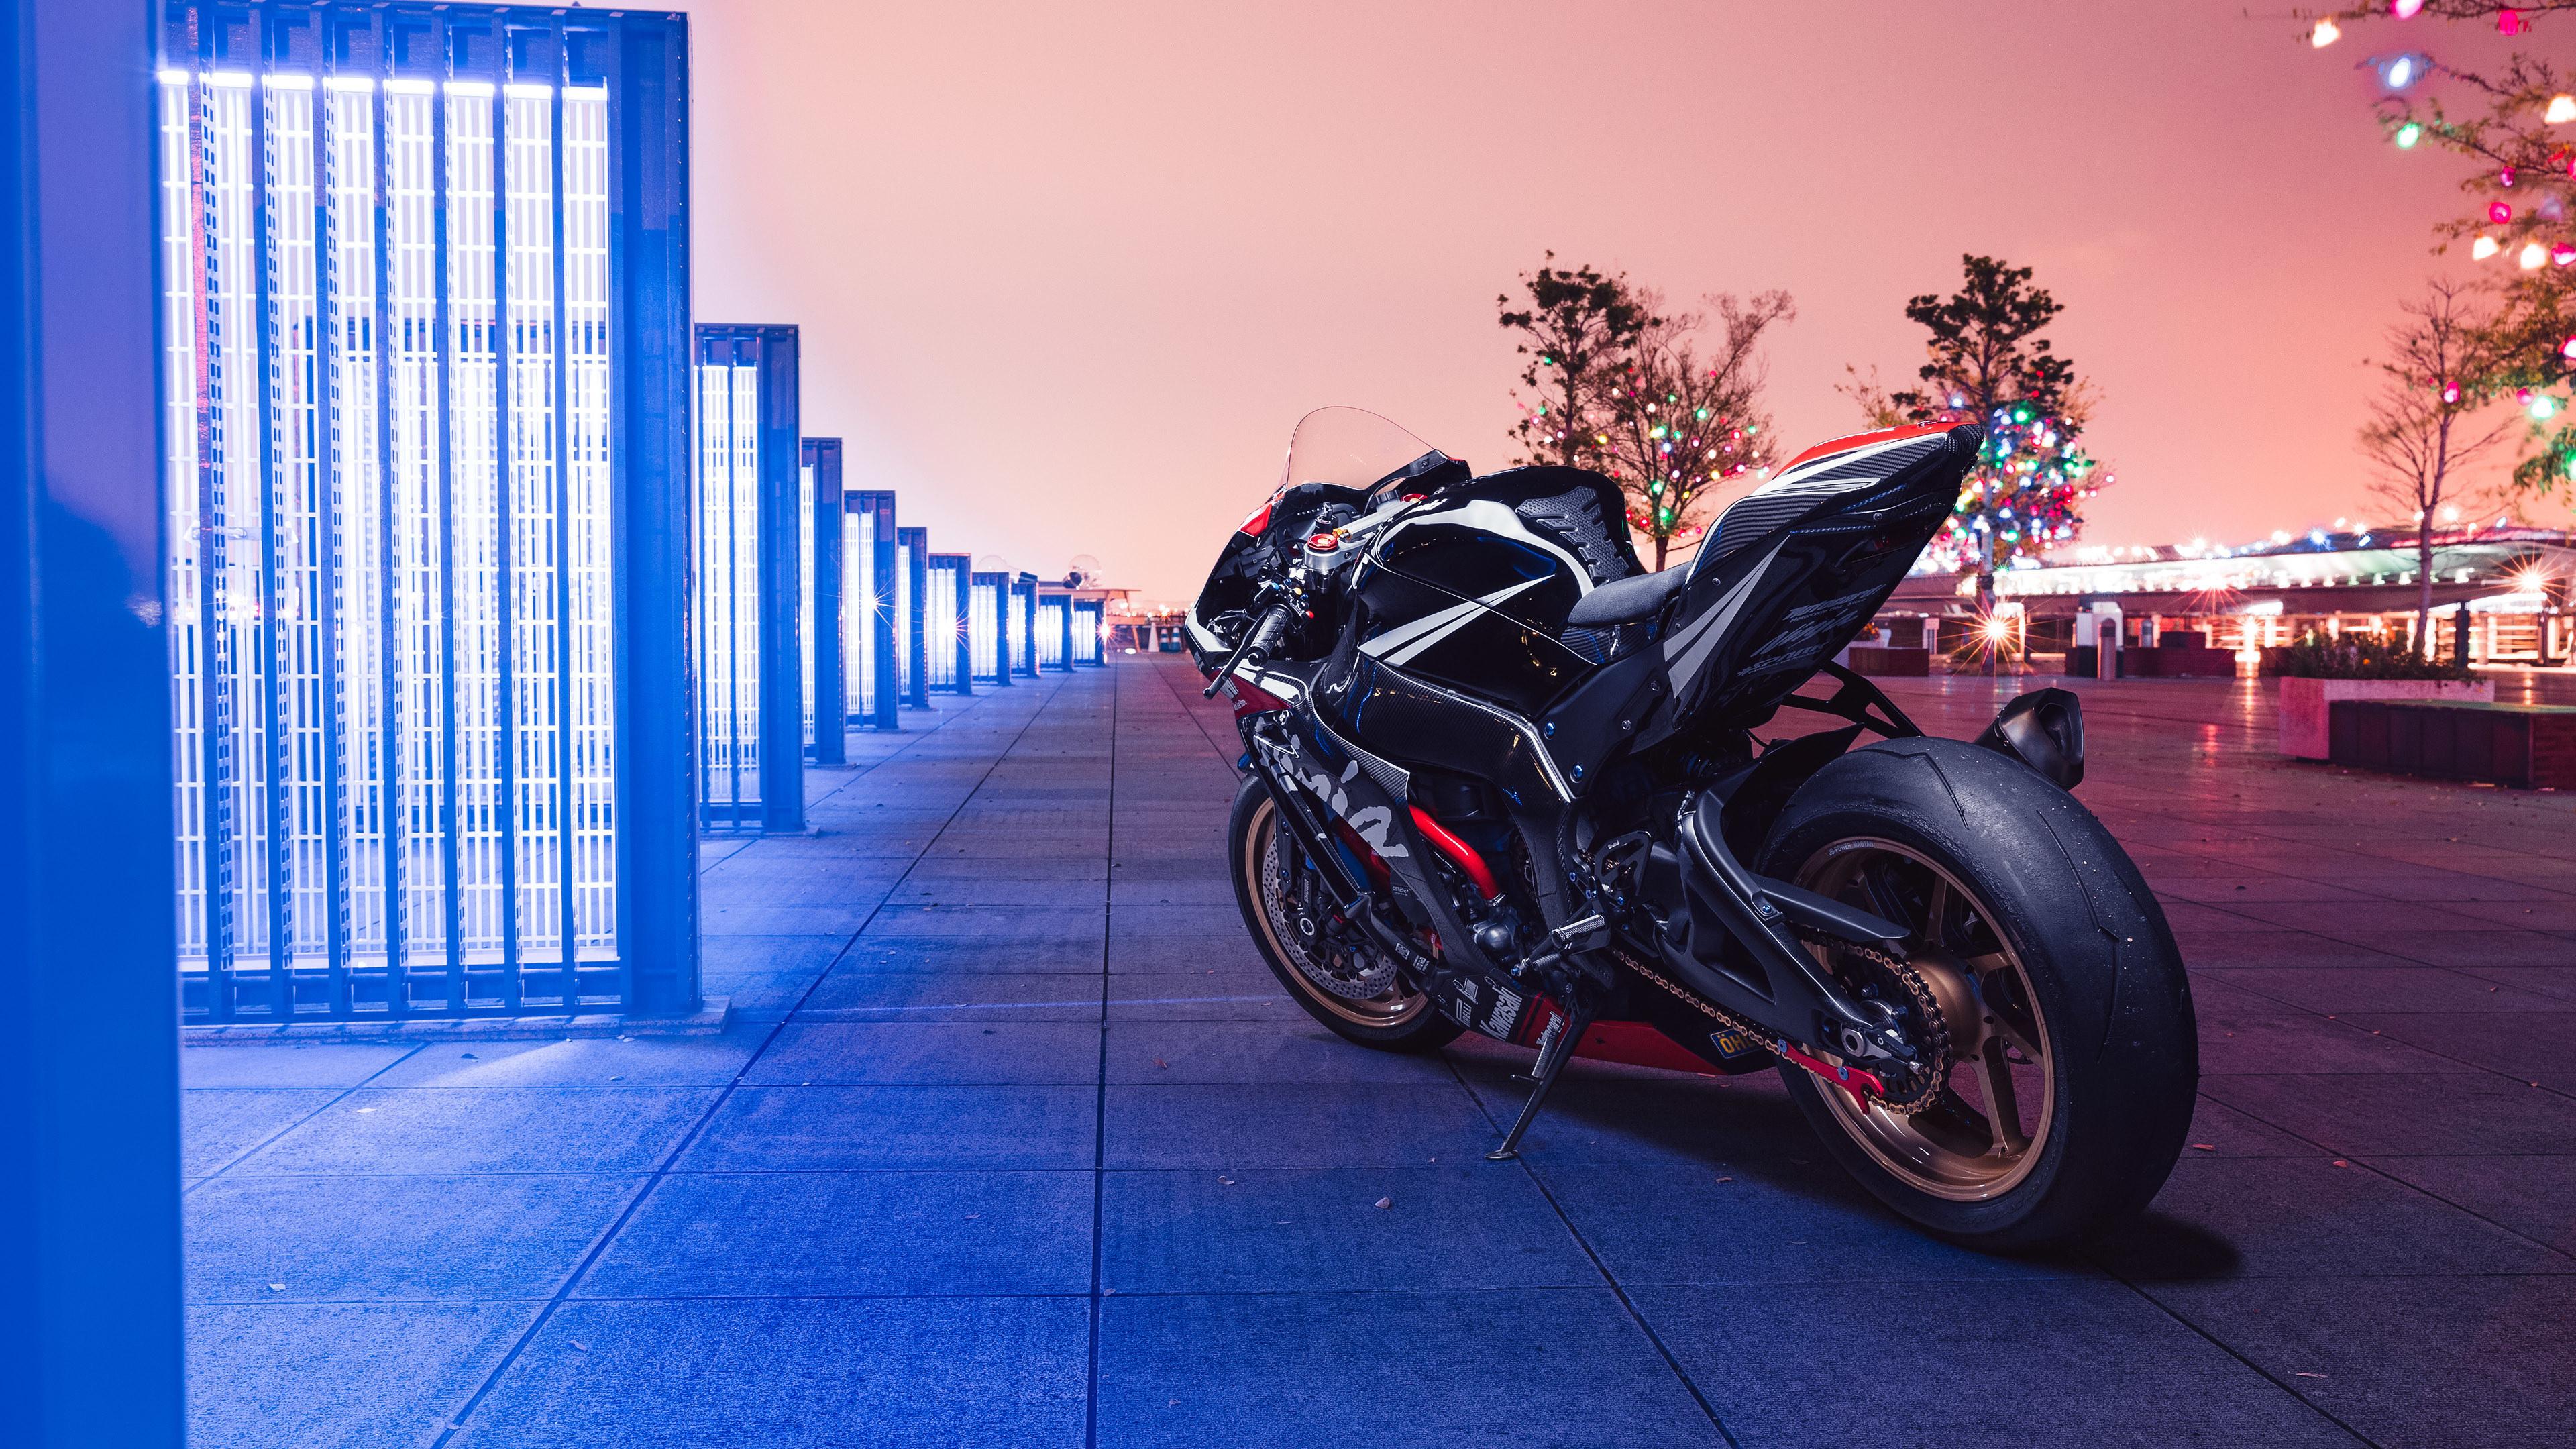 kawasaki zx10r 4k 1541295669 - Kawasaki ZX10R 4k - kawasaki zx10r wallpapers, kawasaki wallpapers, hd-wallpapers, bikes wallpapers, behance wallpapers, 4k-wallpapers